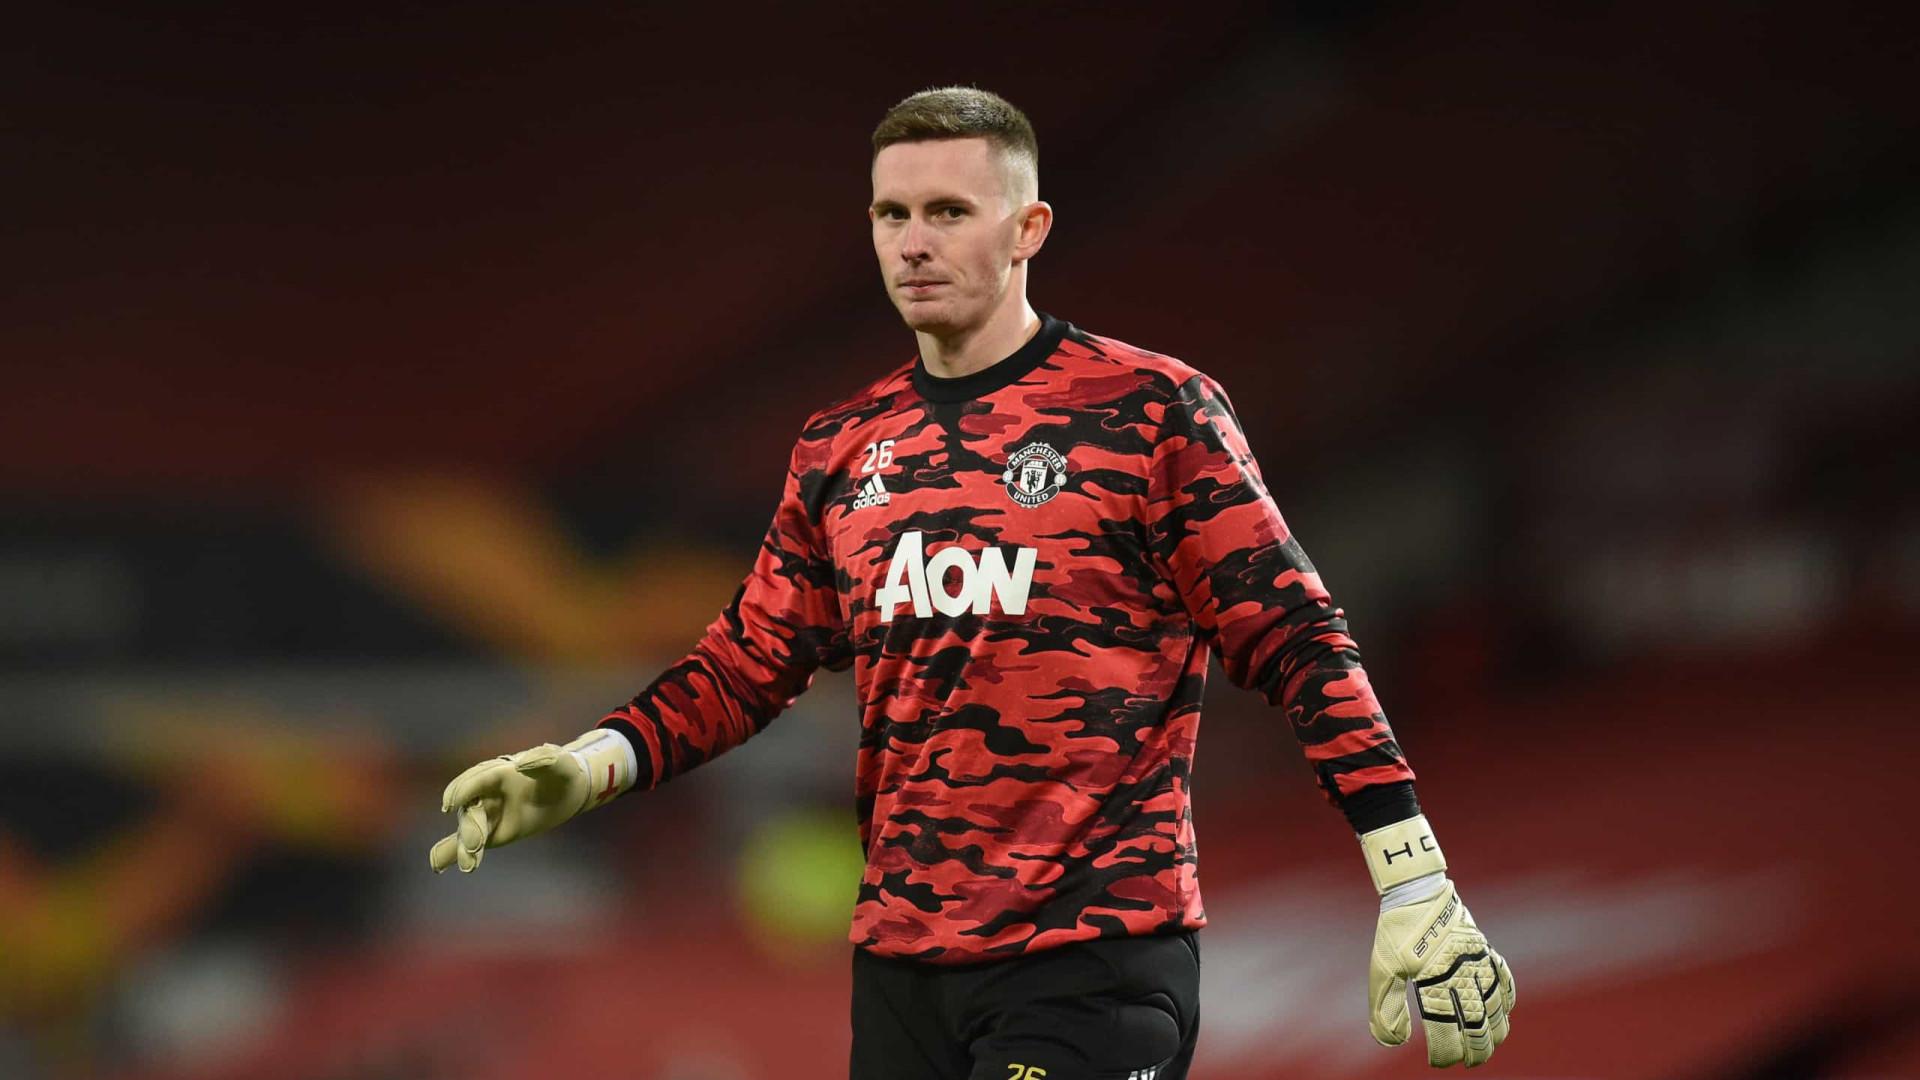 Henderson é operado e será desfalque para o Liverpool por tempo indeterminado